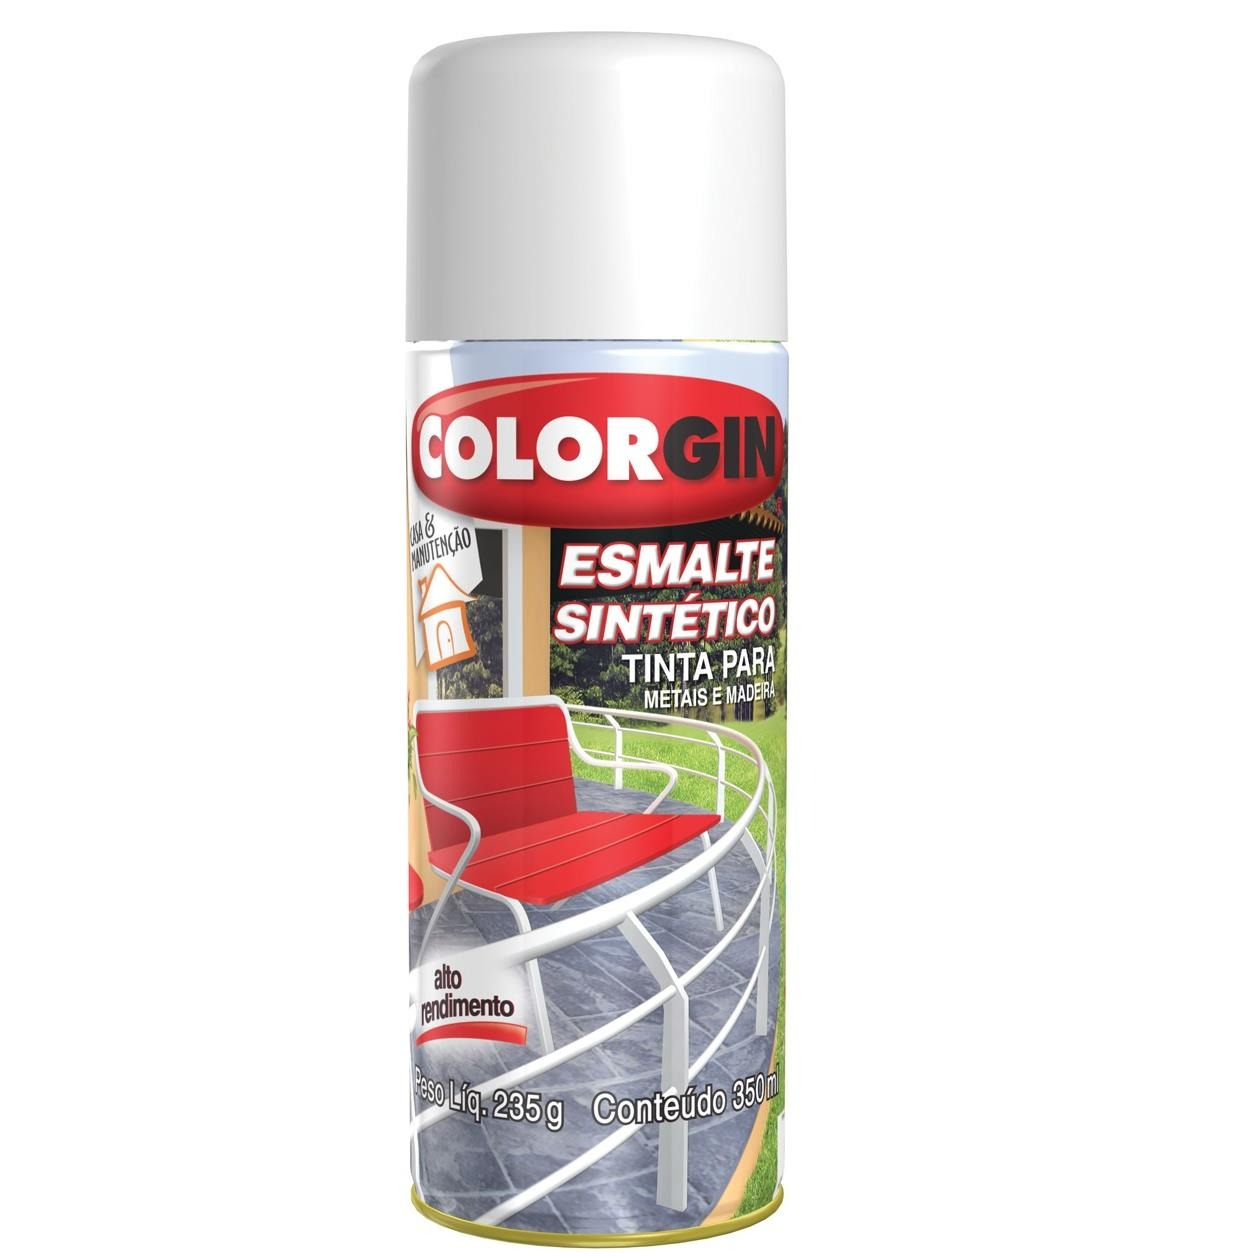 Tinta Spray Brilhante Esmalte sintetico Interno e Externo - Preto - 350ml - Colorgin